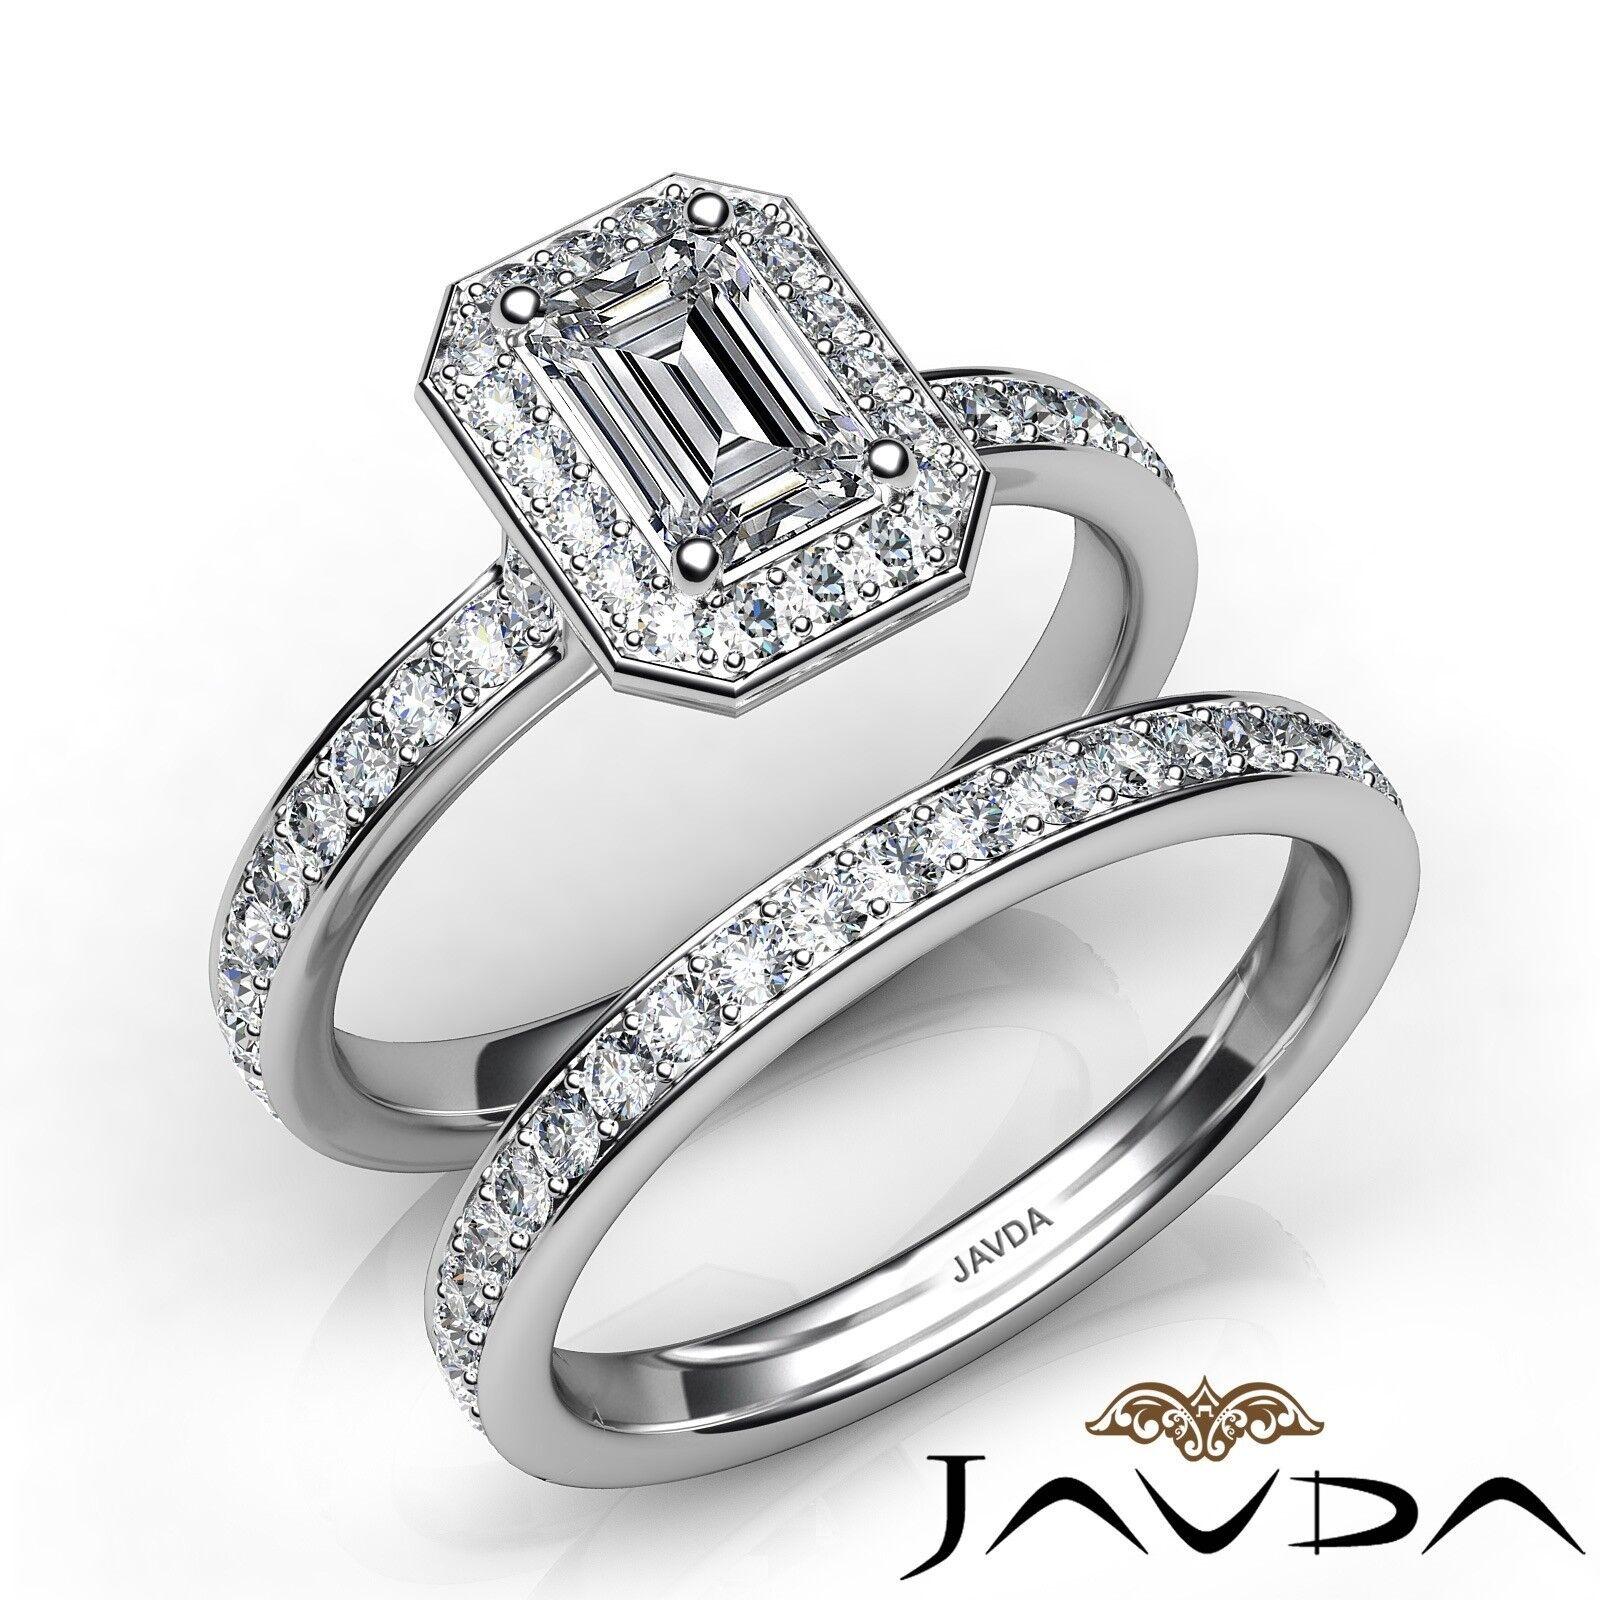 1.45ctw Halo Bridal Side Stone Emerald Diamond Engagement Ring GIA H-VVS2 W Gold